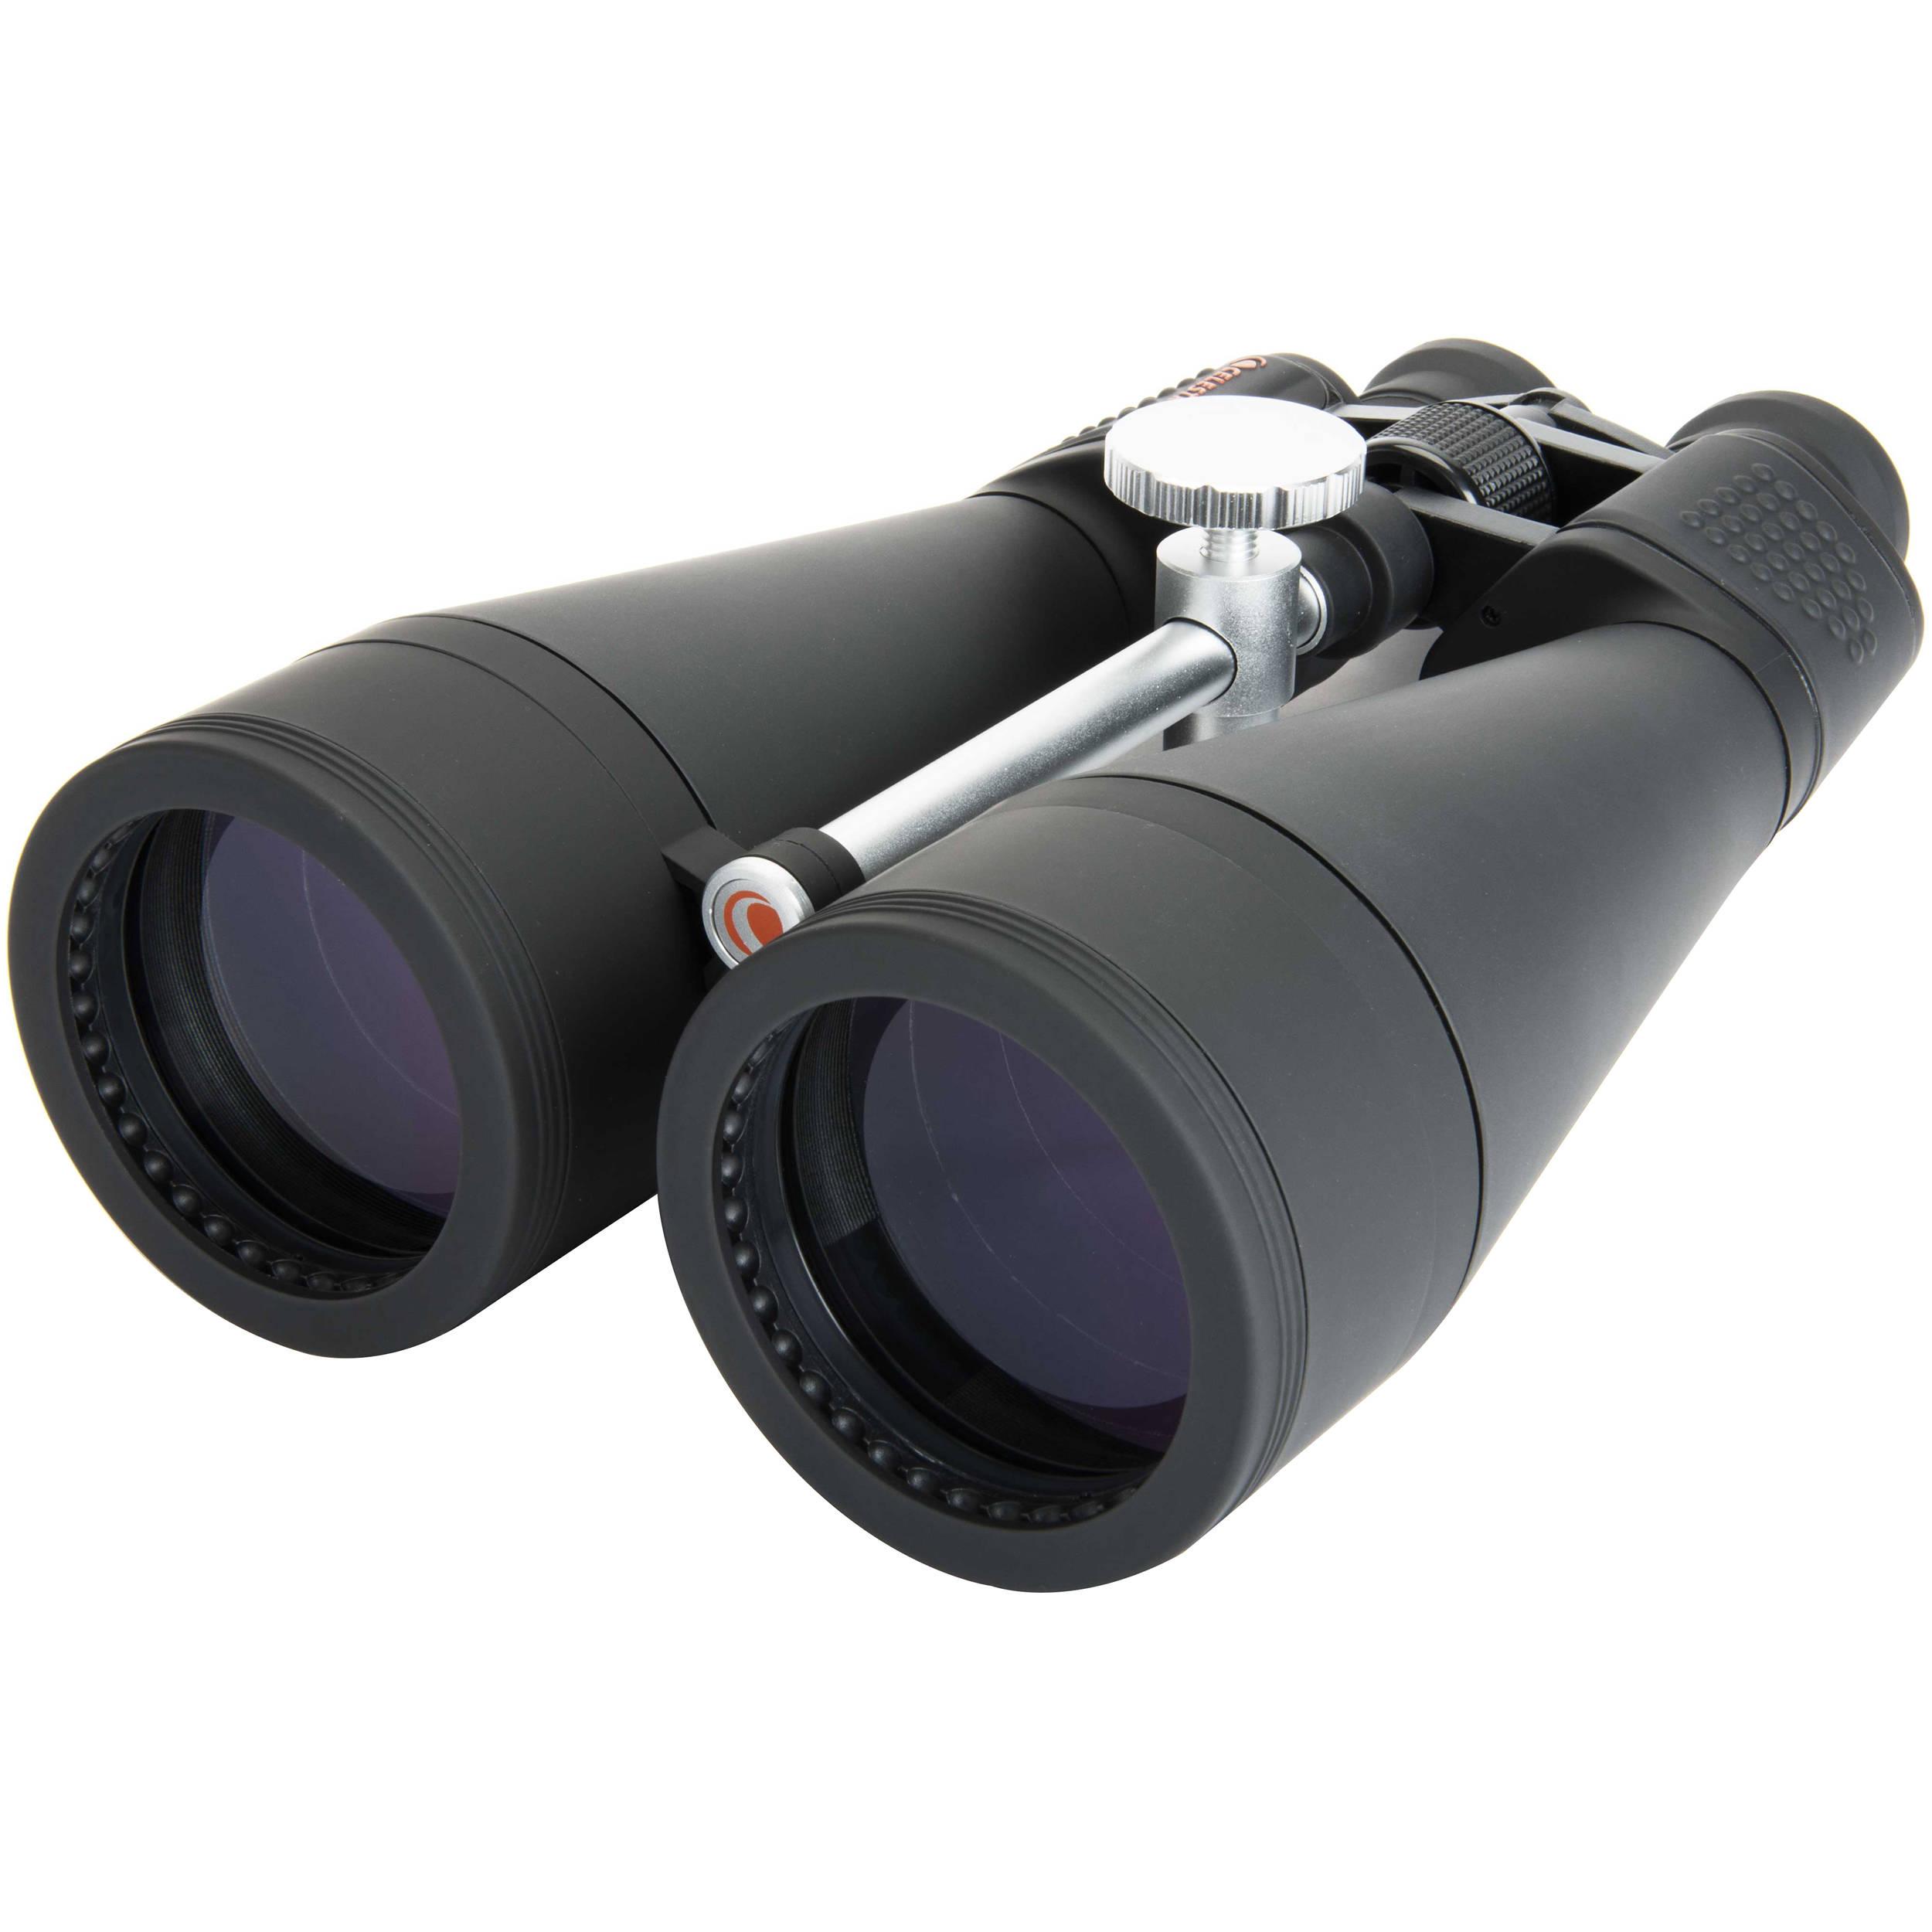 Celestron SkyMaster Pro 20x80 Porro Prism Astronomy Binoculars